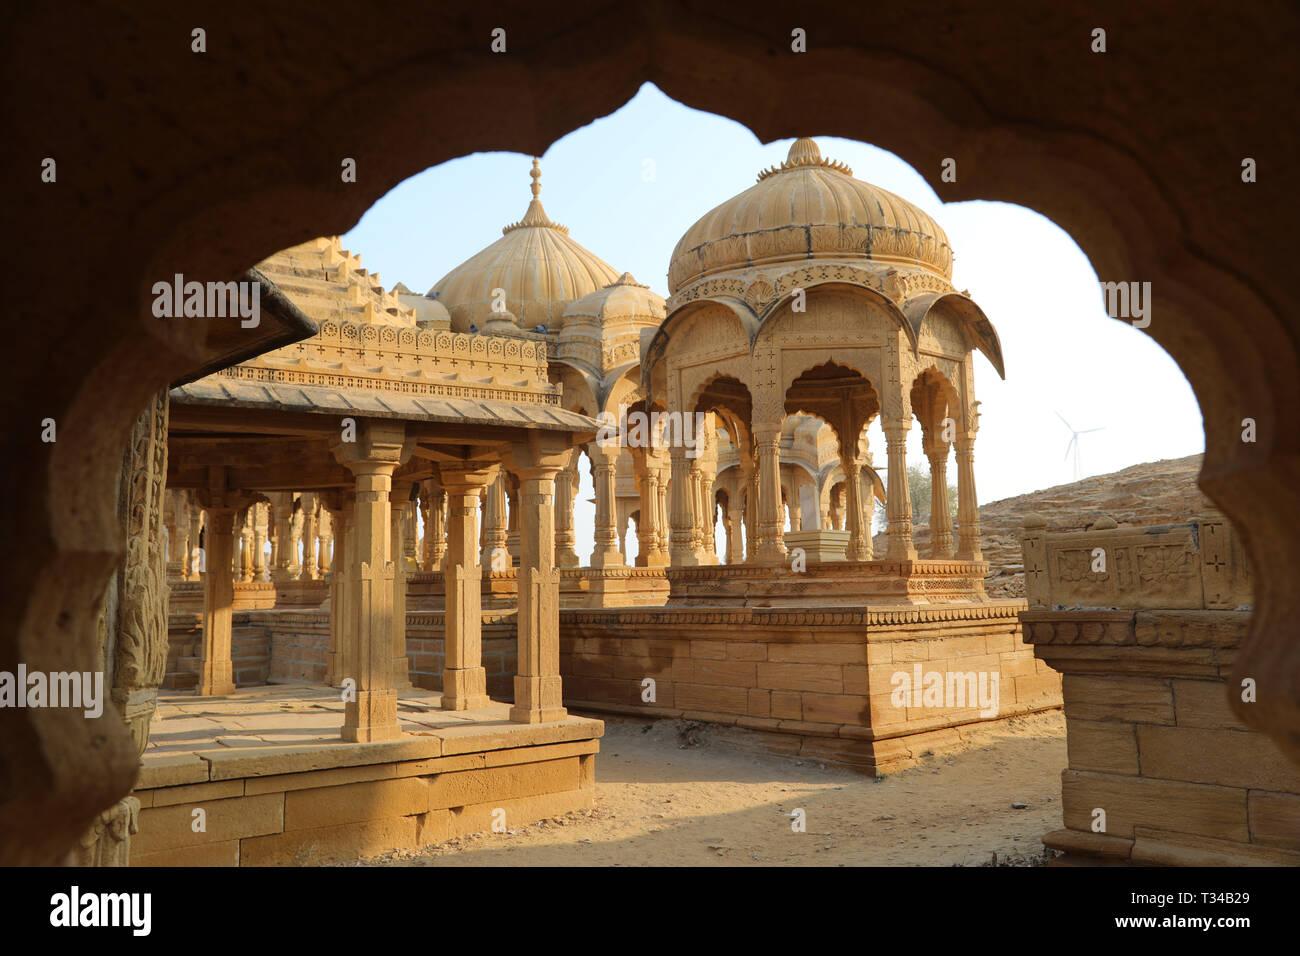 Bada Bagh, Jaisalmer, Rajasthan, India --- Cenotaphs old burial site of the rulers of jaisalmer Desert Stock Photo